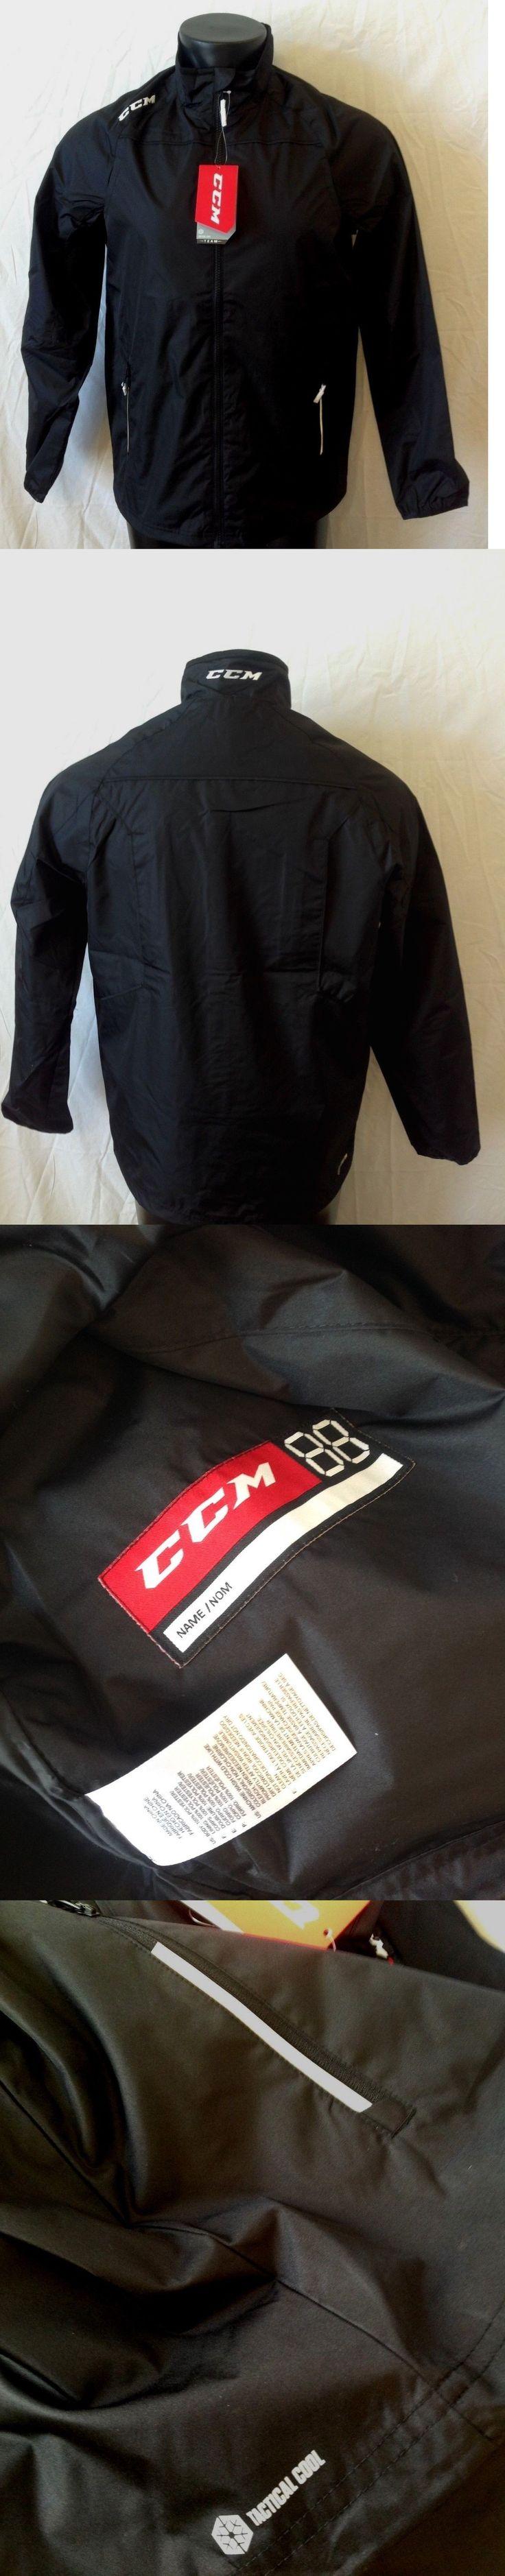 Men 159122: Ccm Hockey Lightweight Rink Suit Jacket-Black Senior Adult Size S -> BUY IT NOW ONLY: $63 on eBay!